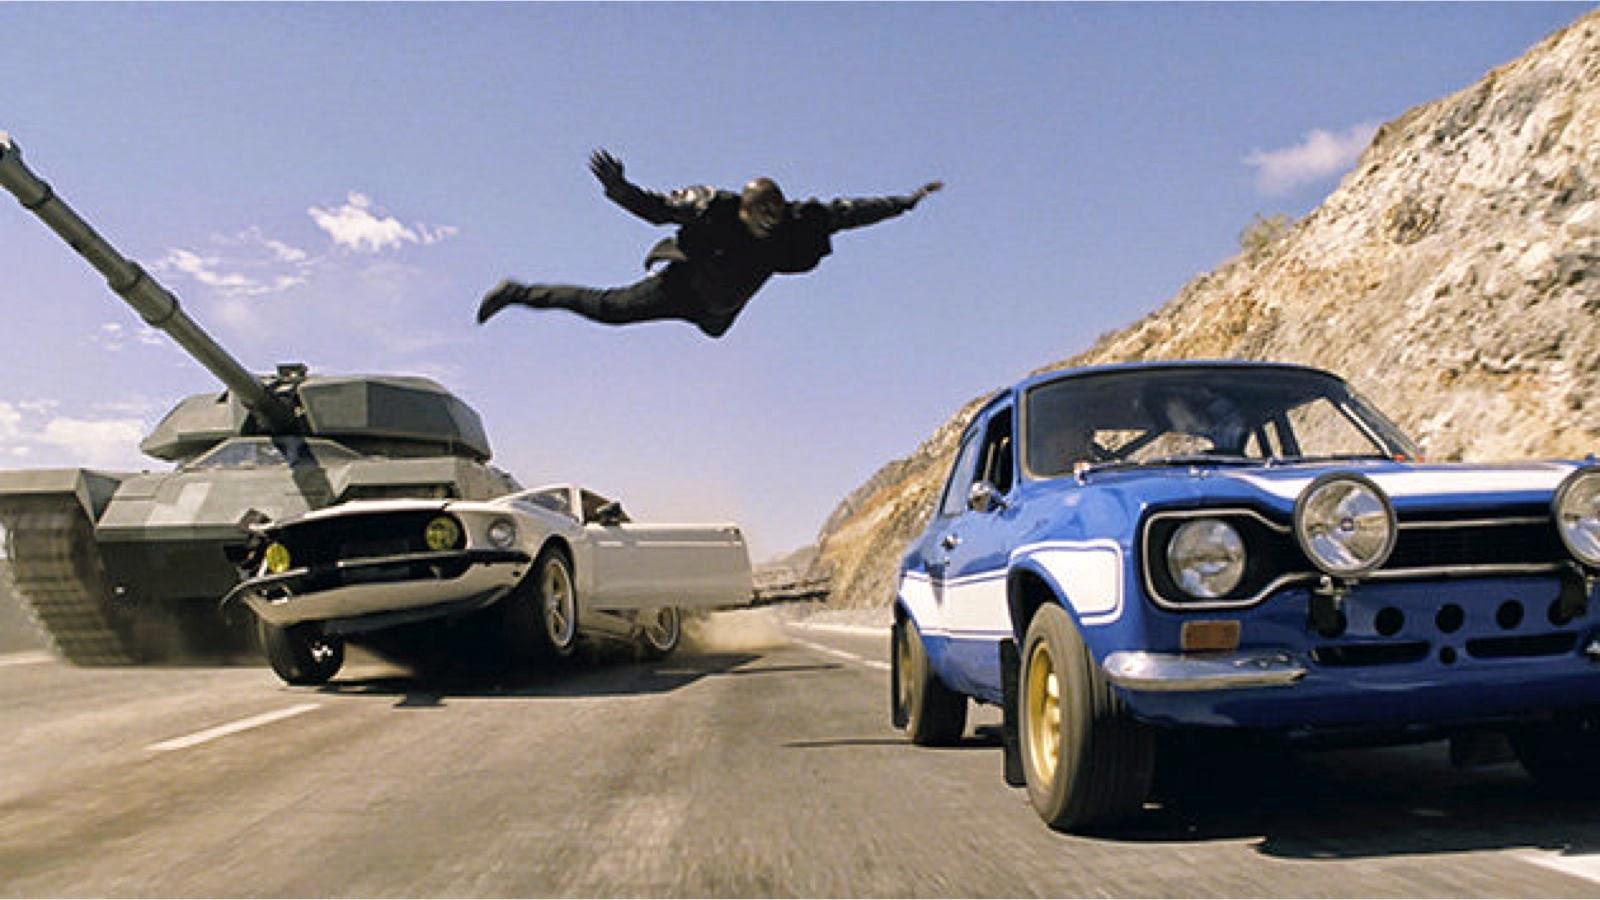 https://1.bp.blogspot.com/-h6QtFtT0rk8/U9lBIf426eI/AAAAAAAAaD0/iqPfNCl5Fp8/s1600/Fast-Furious-6-2013.jpg